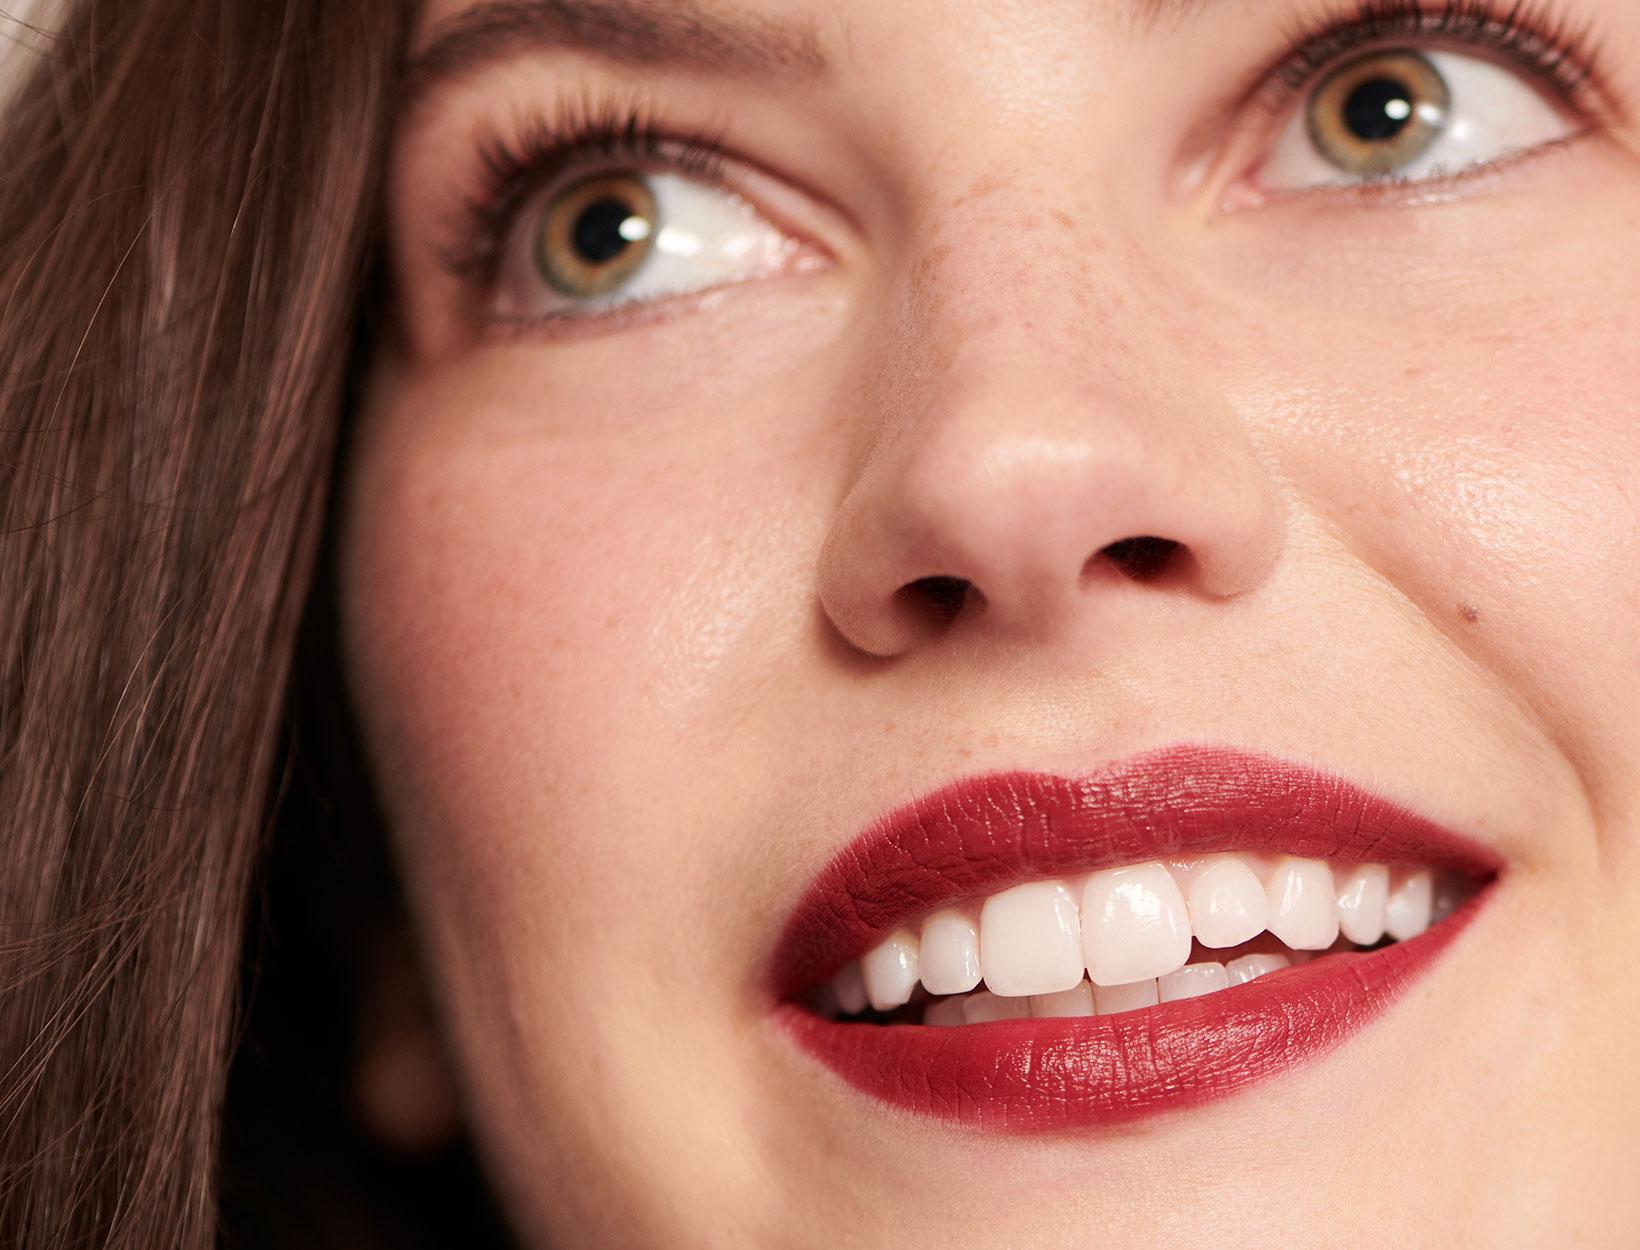 Model smiling wearing red lipstick